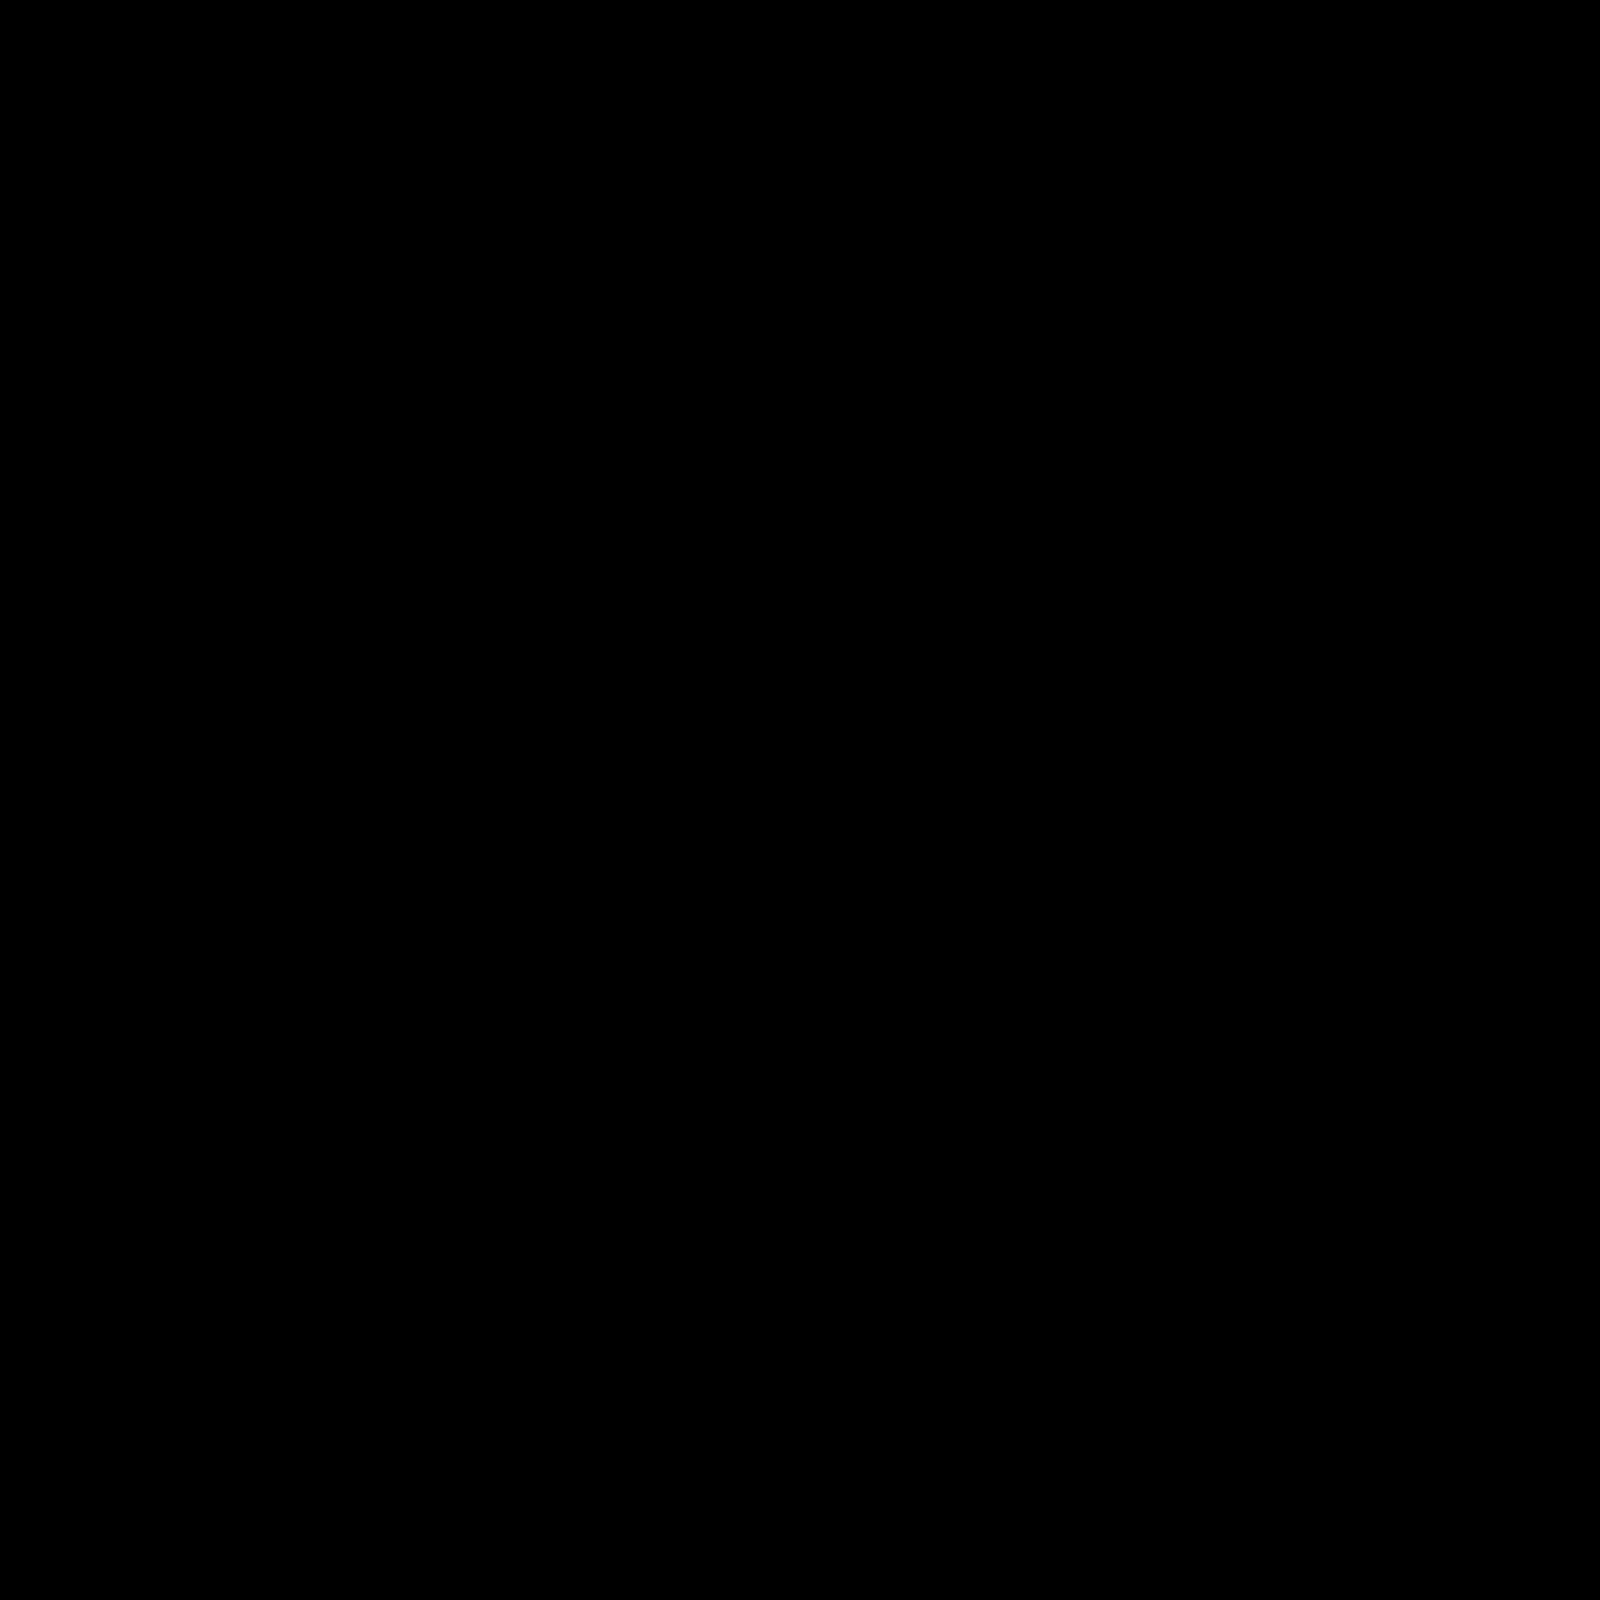 Hand Right icon